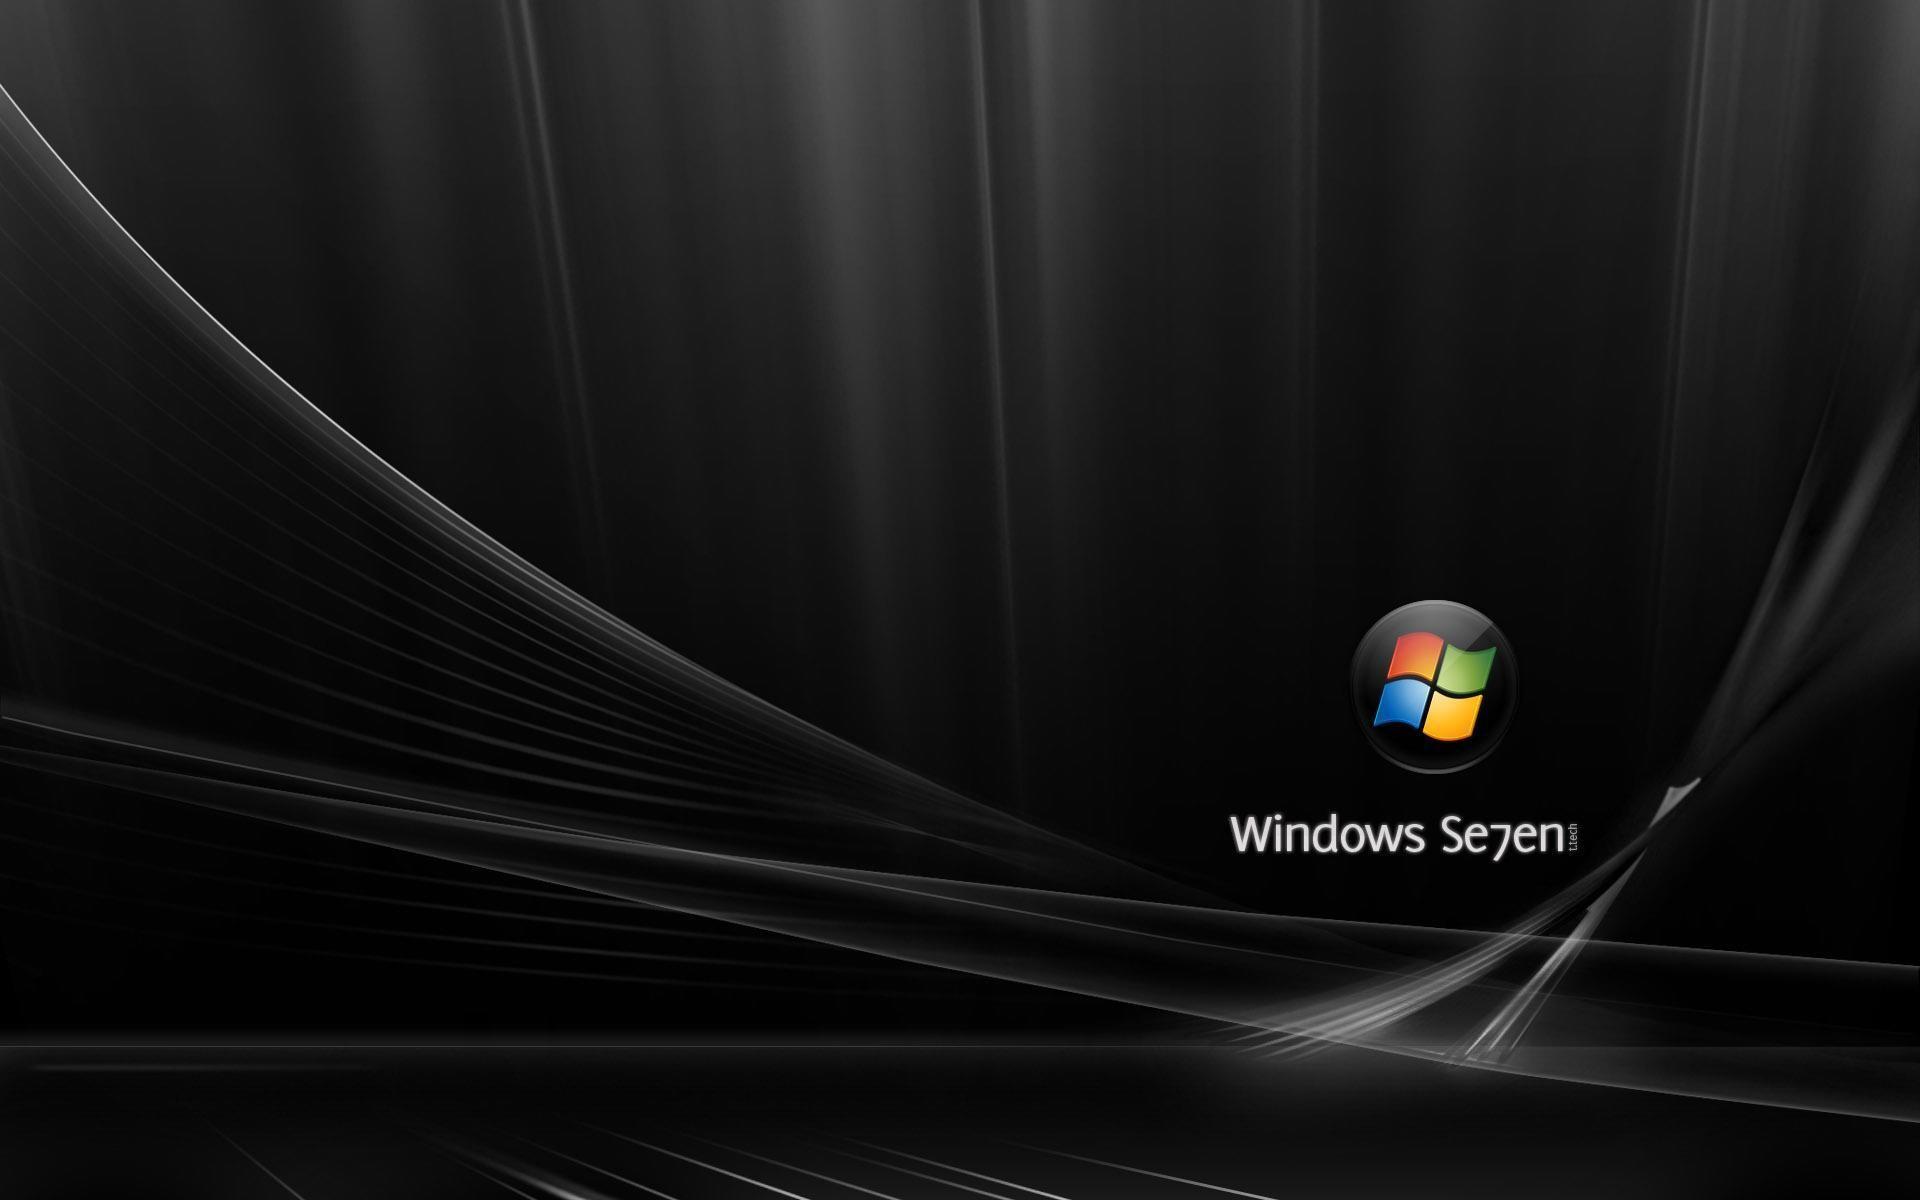 Windows 7 Home Premium Wallpaper 1